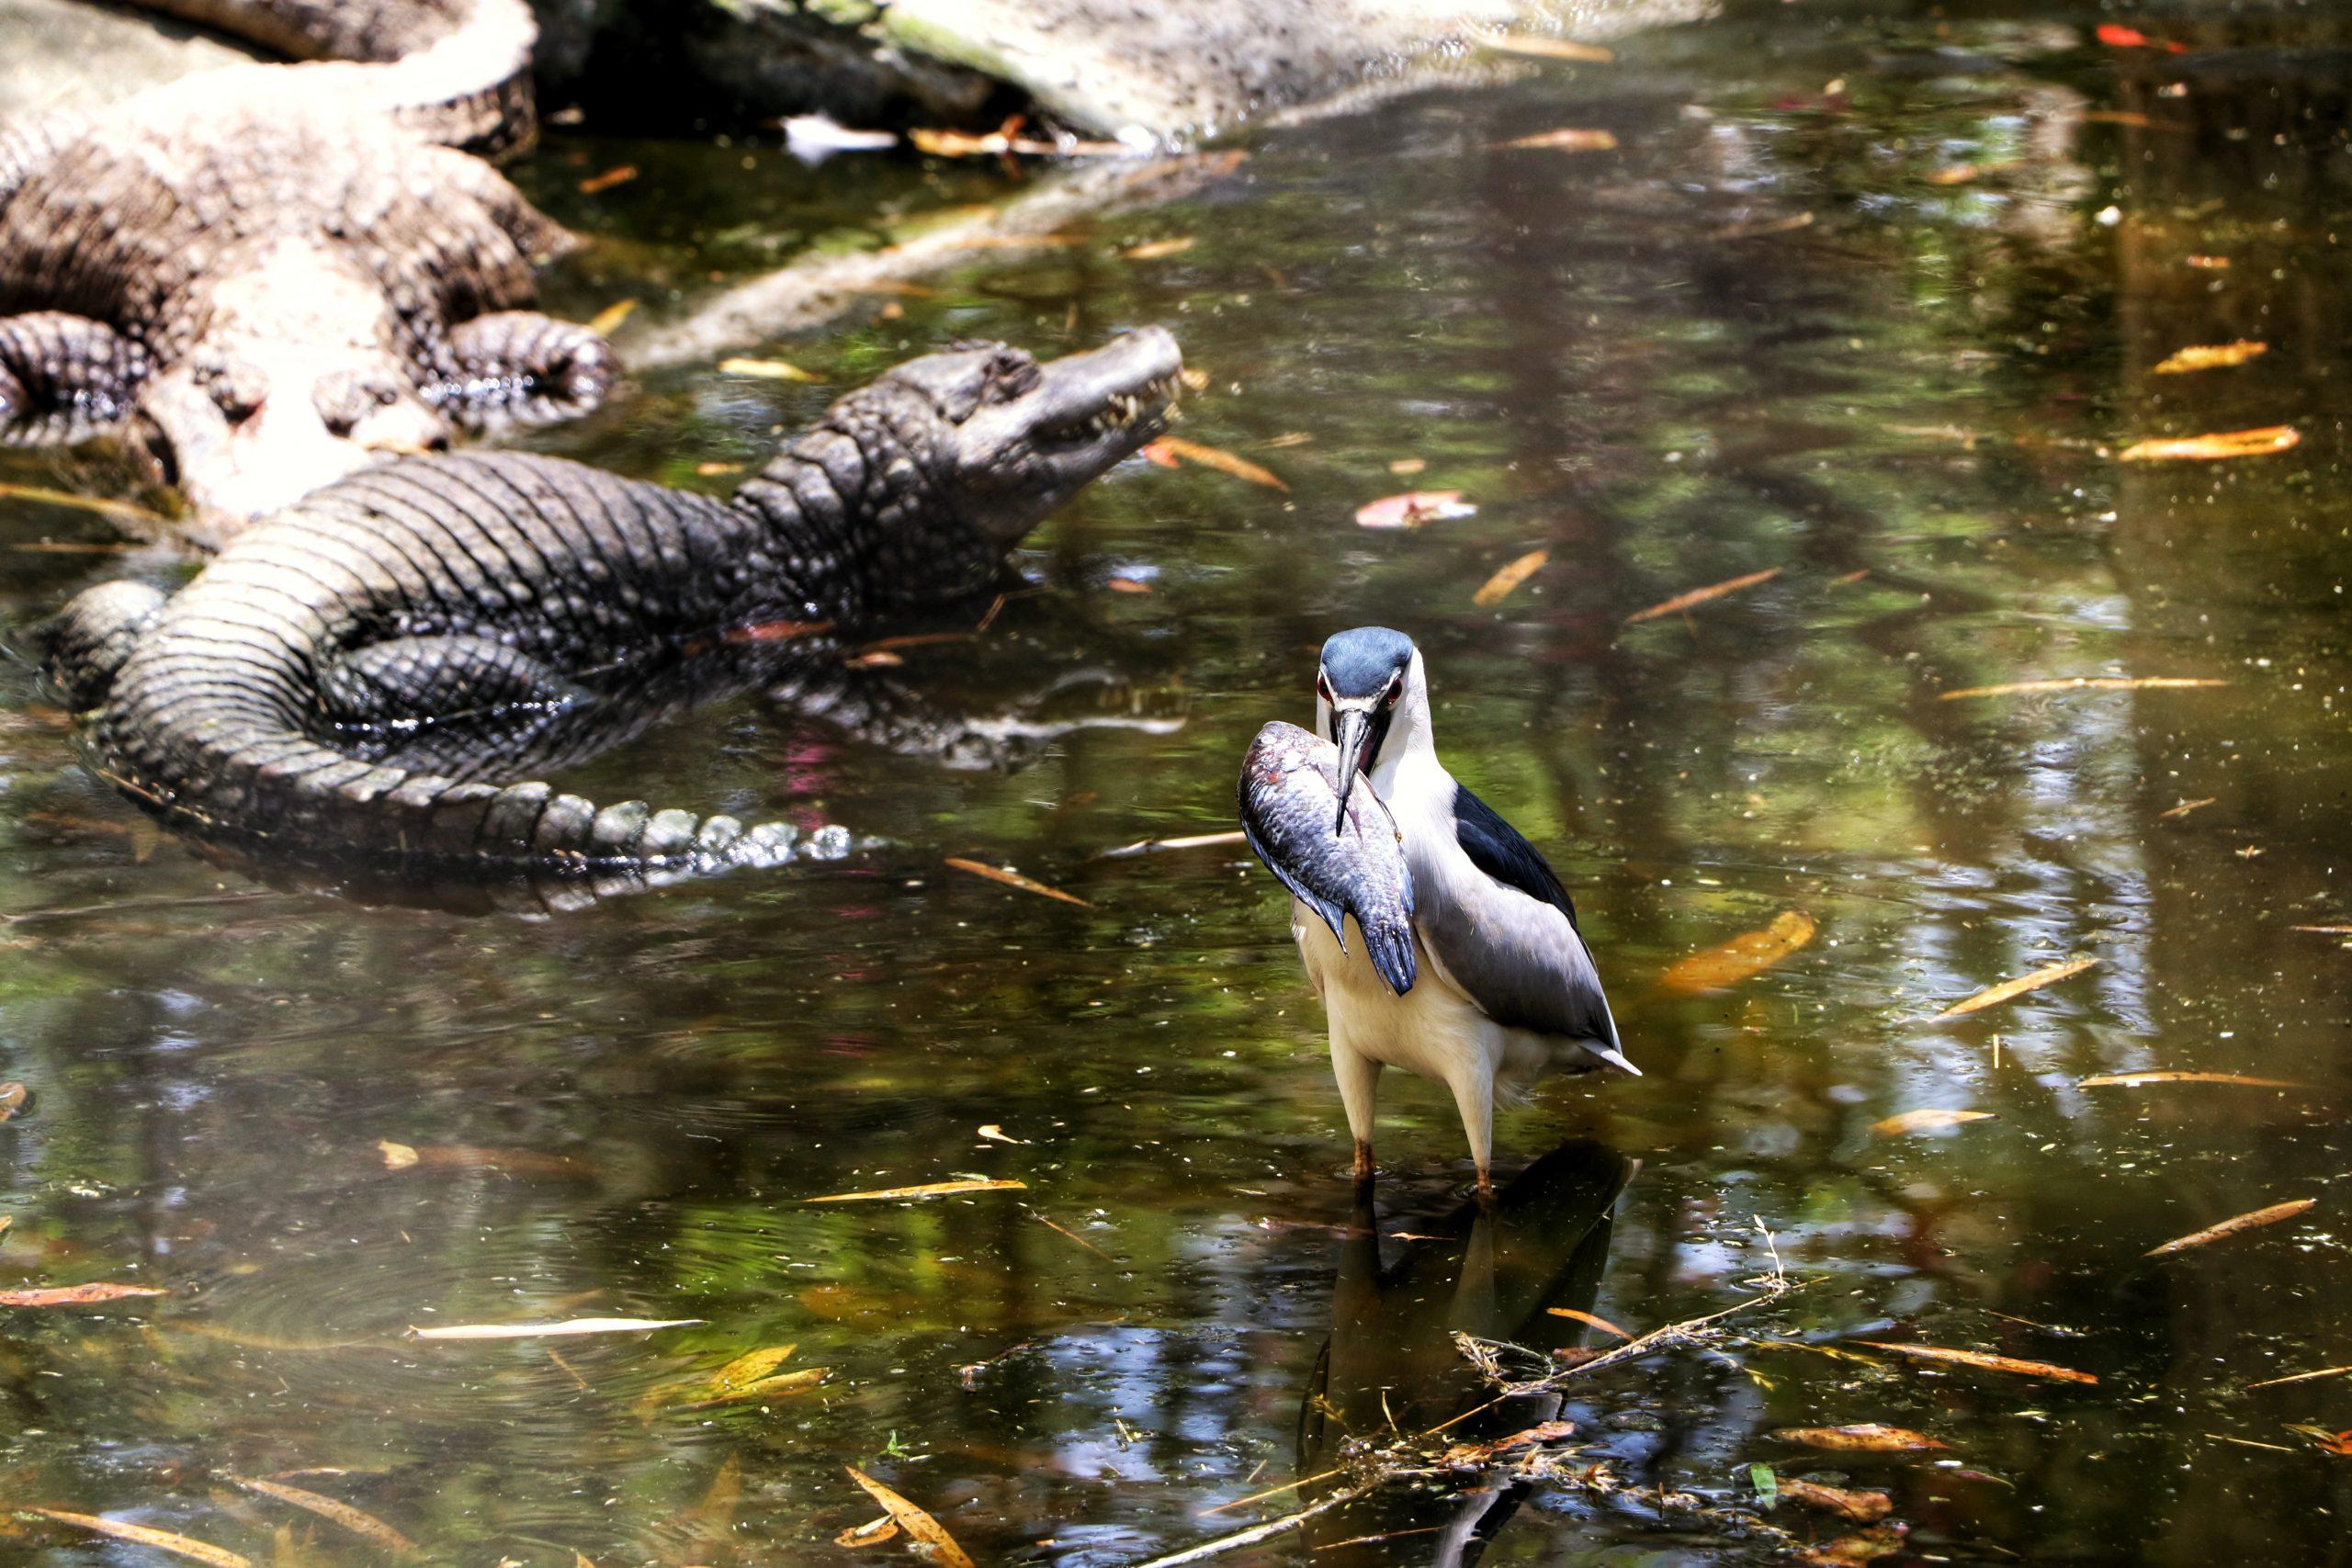 A bird and crocodiles in a pond